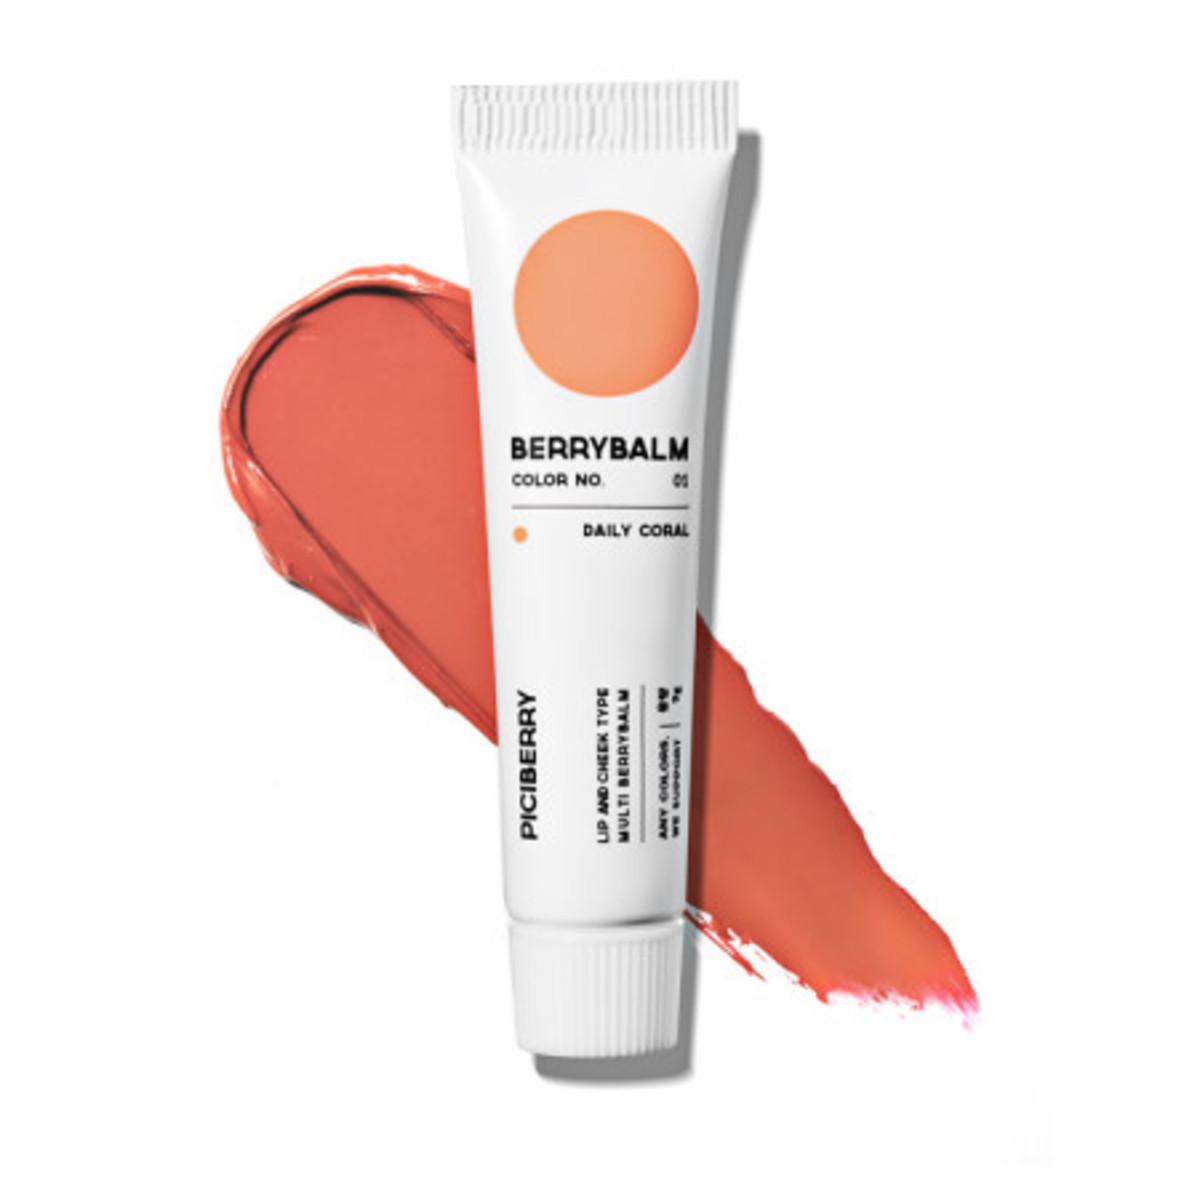 Berry Balm_Daily Coral 01 | 2019 Korea Big HIT Brand-Korea Direct Shipping